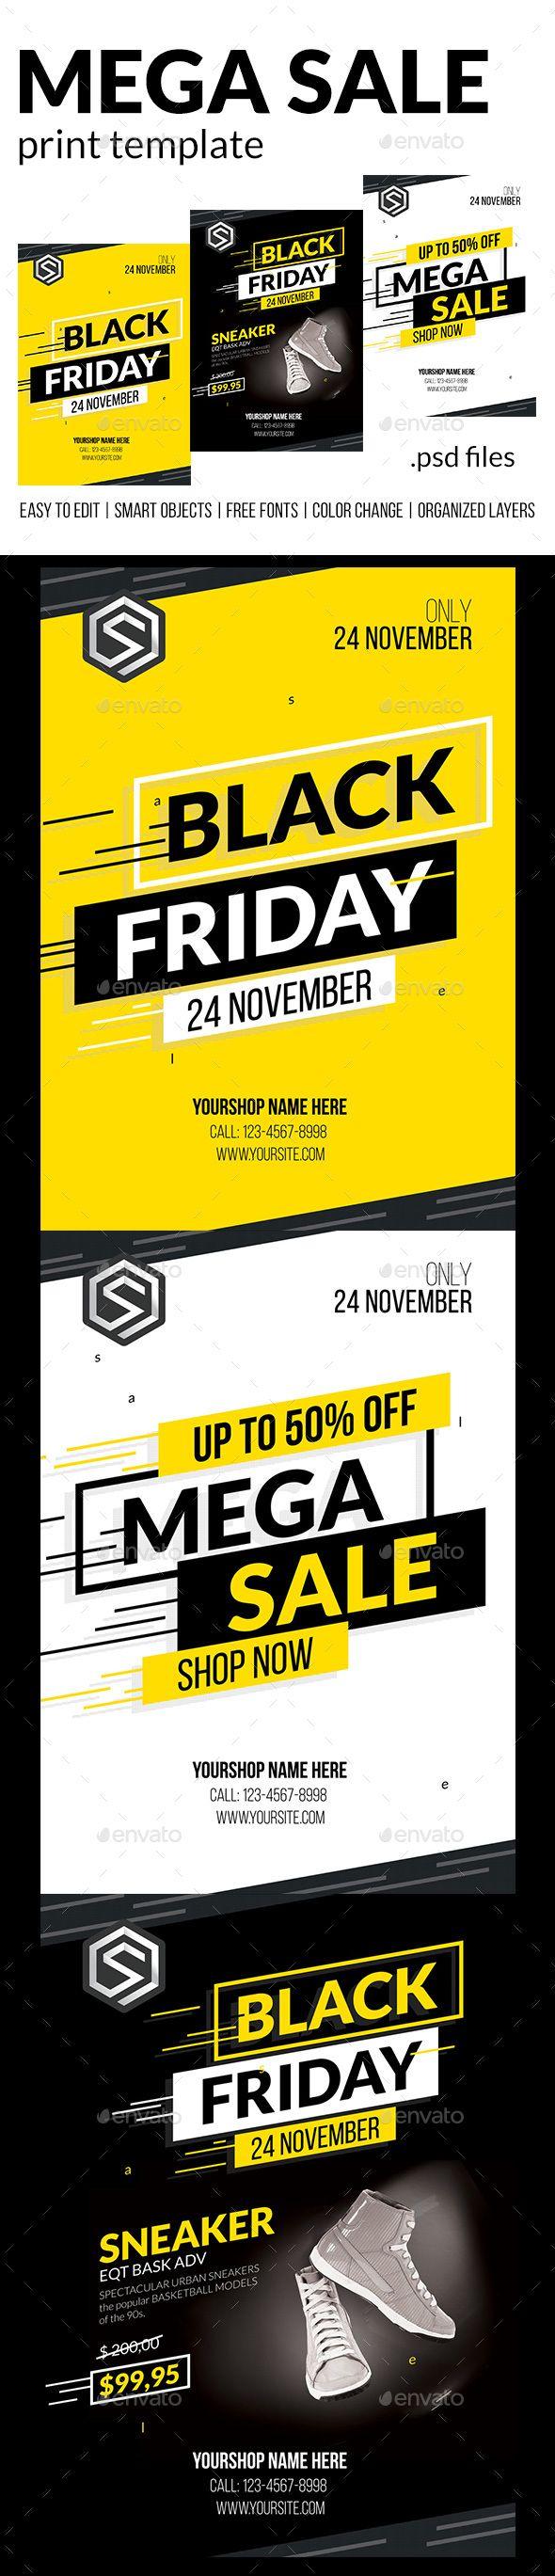 Mega Sale Flyer Design Templates PSD. Download here: graphicriver.net/…